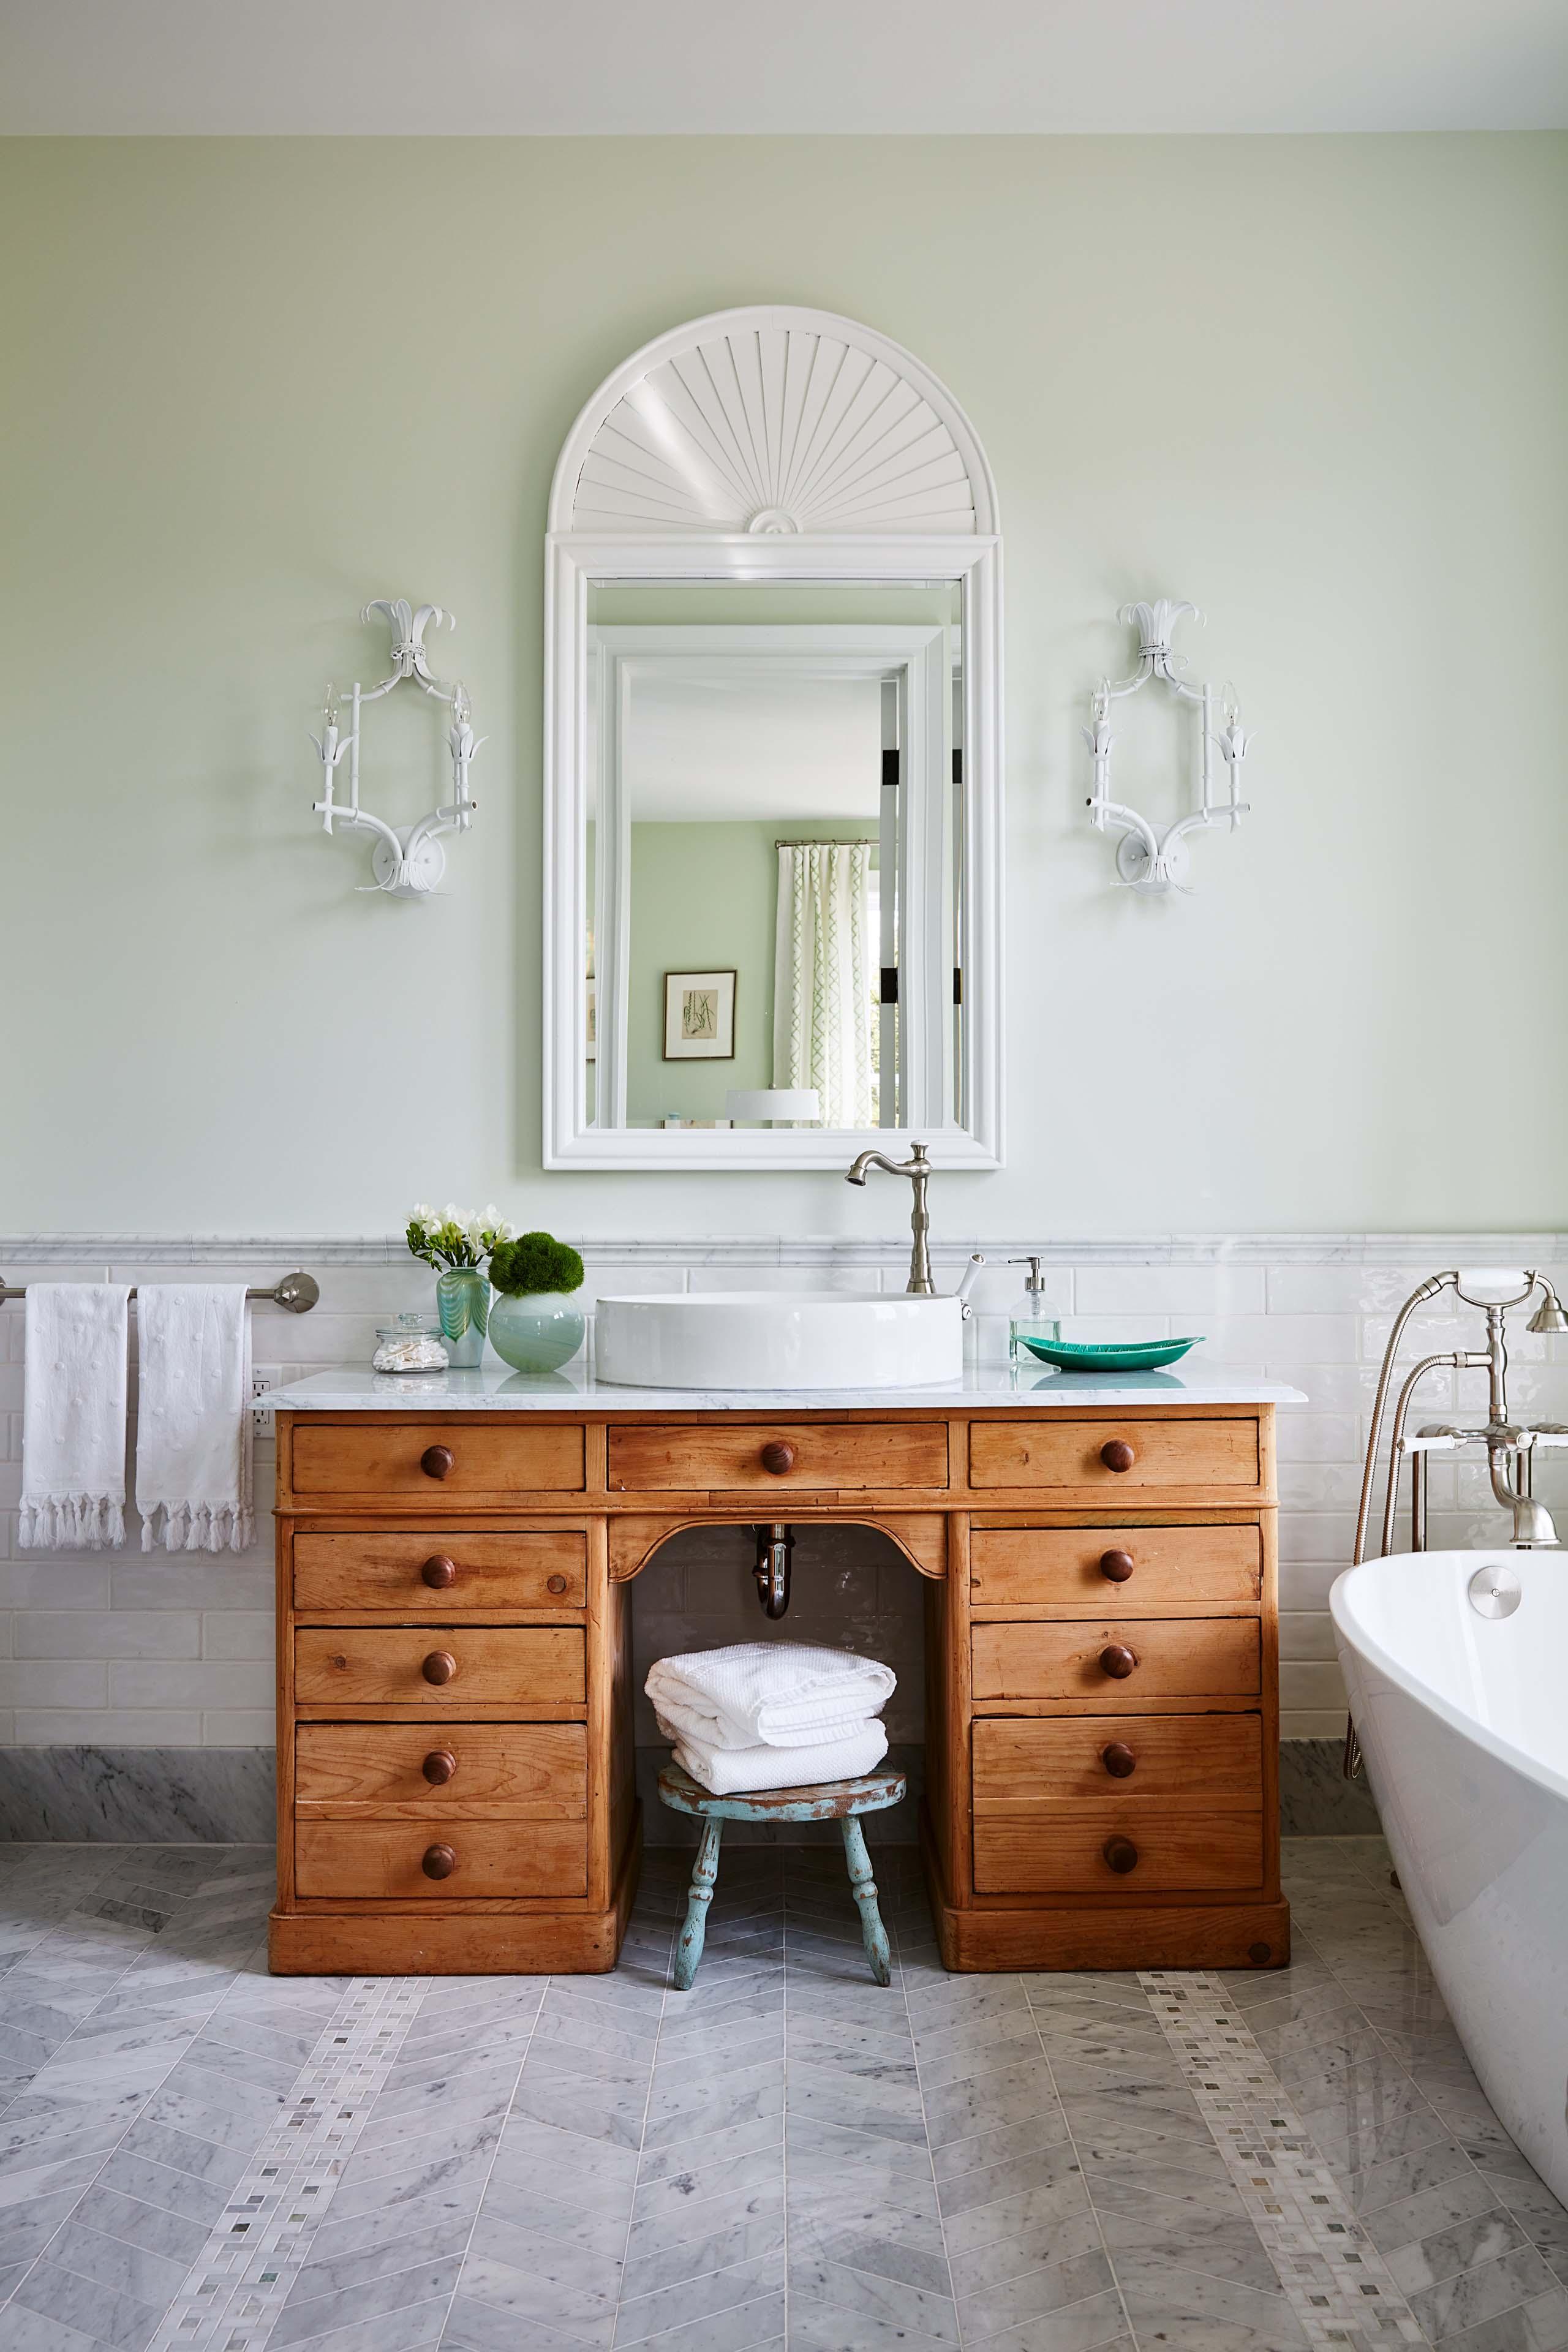 Vintage style decor in bathroom by #SarahRichardson #repurposedvanity #eclecticbathrom